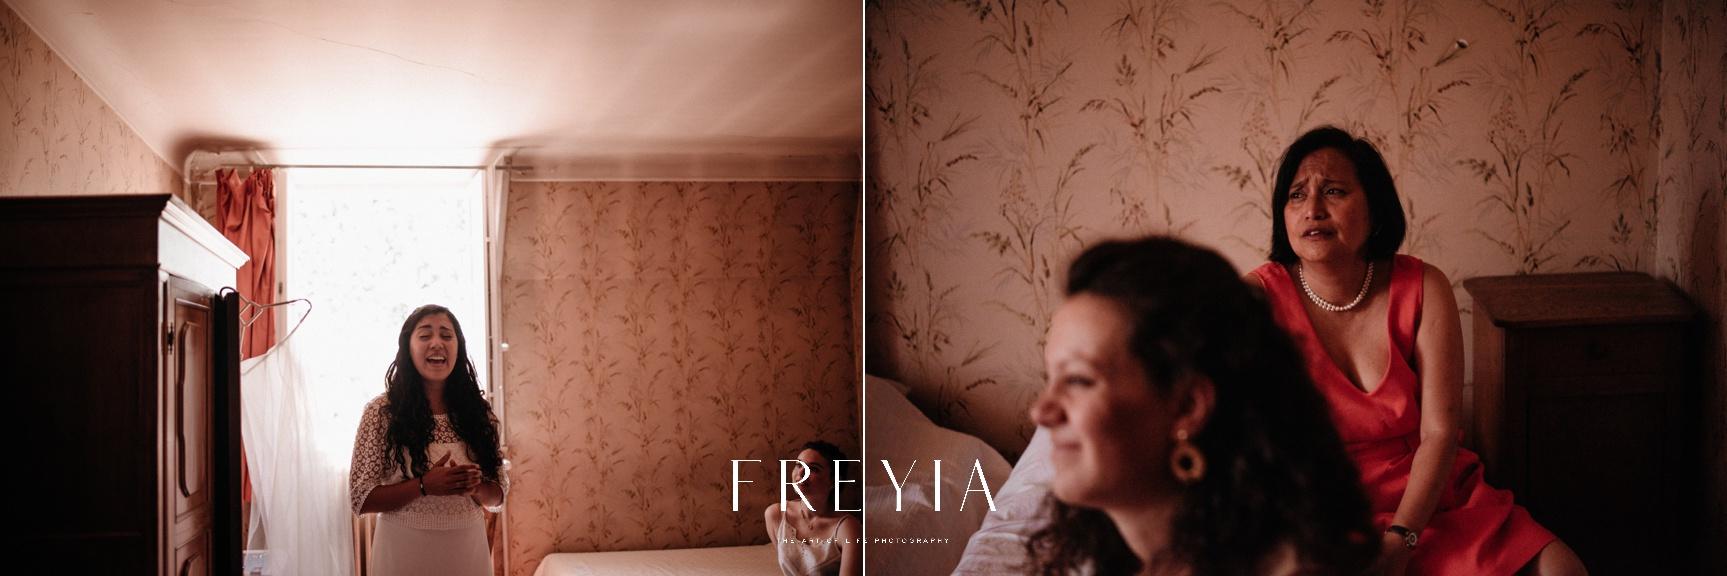 R + T |  mariage reportage alternatif moody intime minimaliste vintage naturel boho boheme |  PHOTOGRAPHE mariage PARIS france destination  | FREYIA photography_-84.jpg